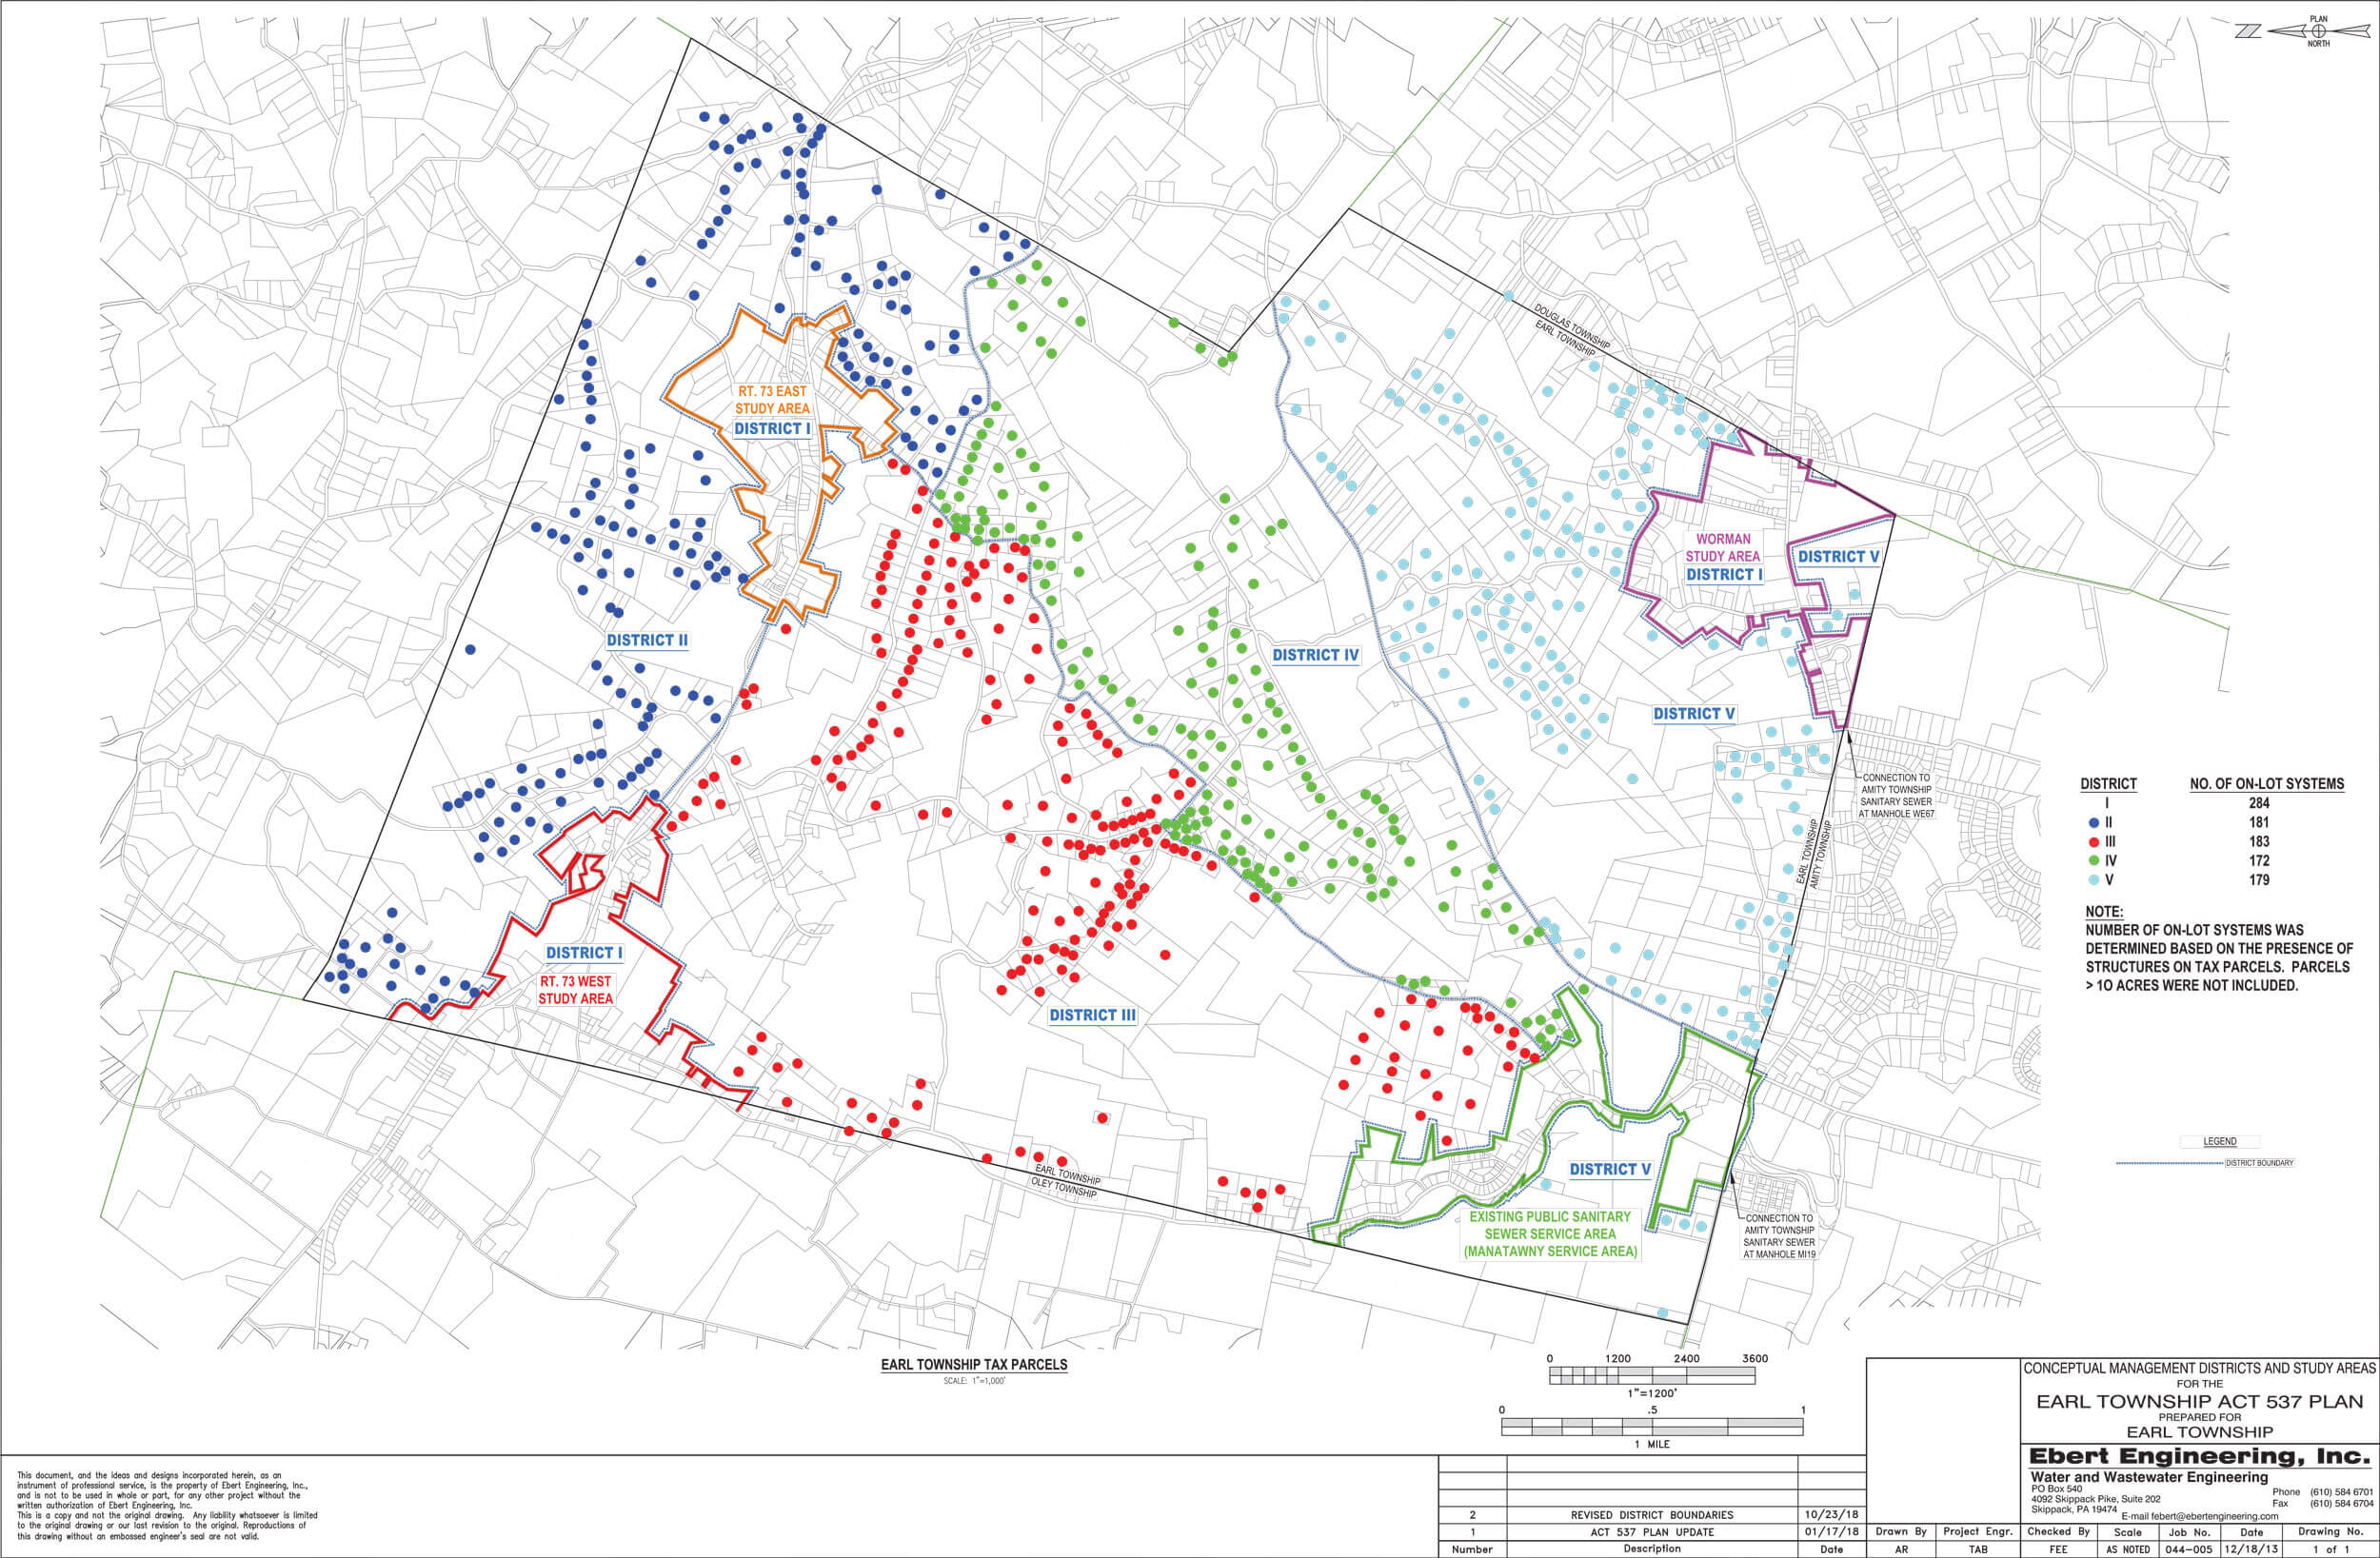 044-005---Study-Areas